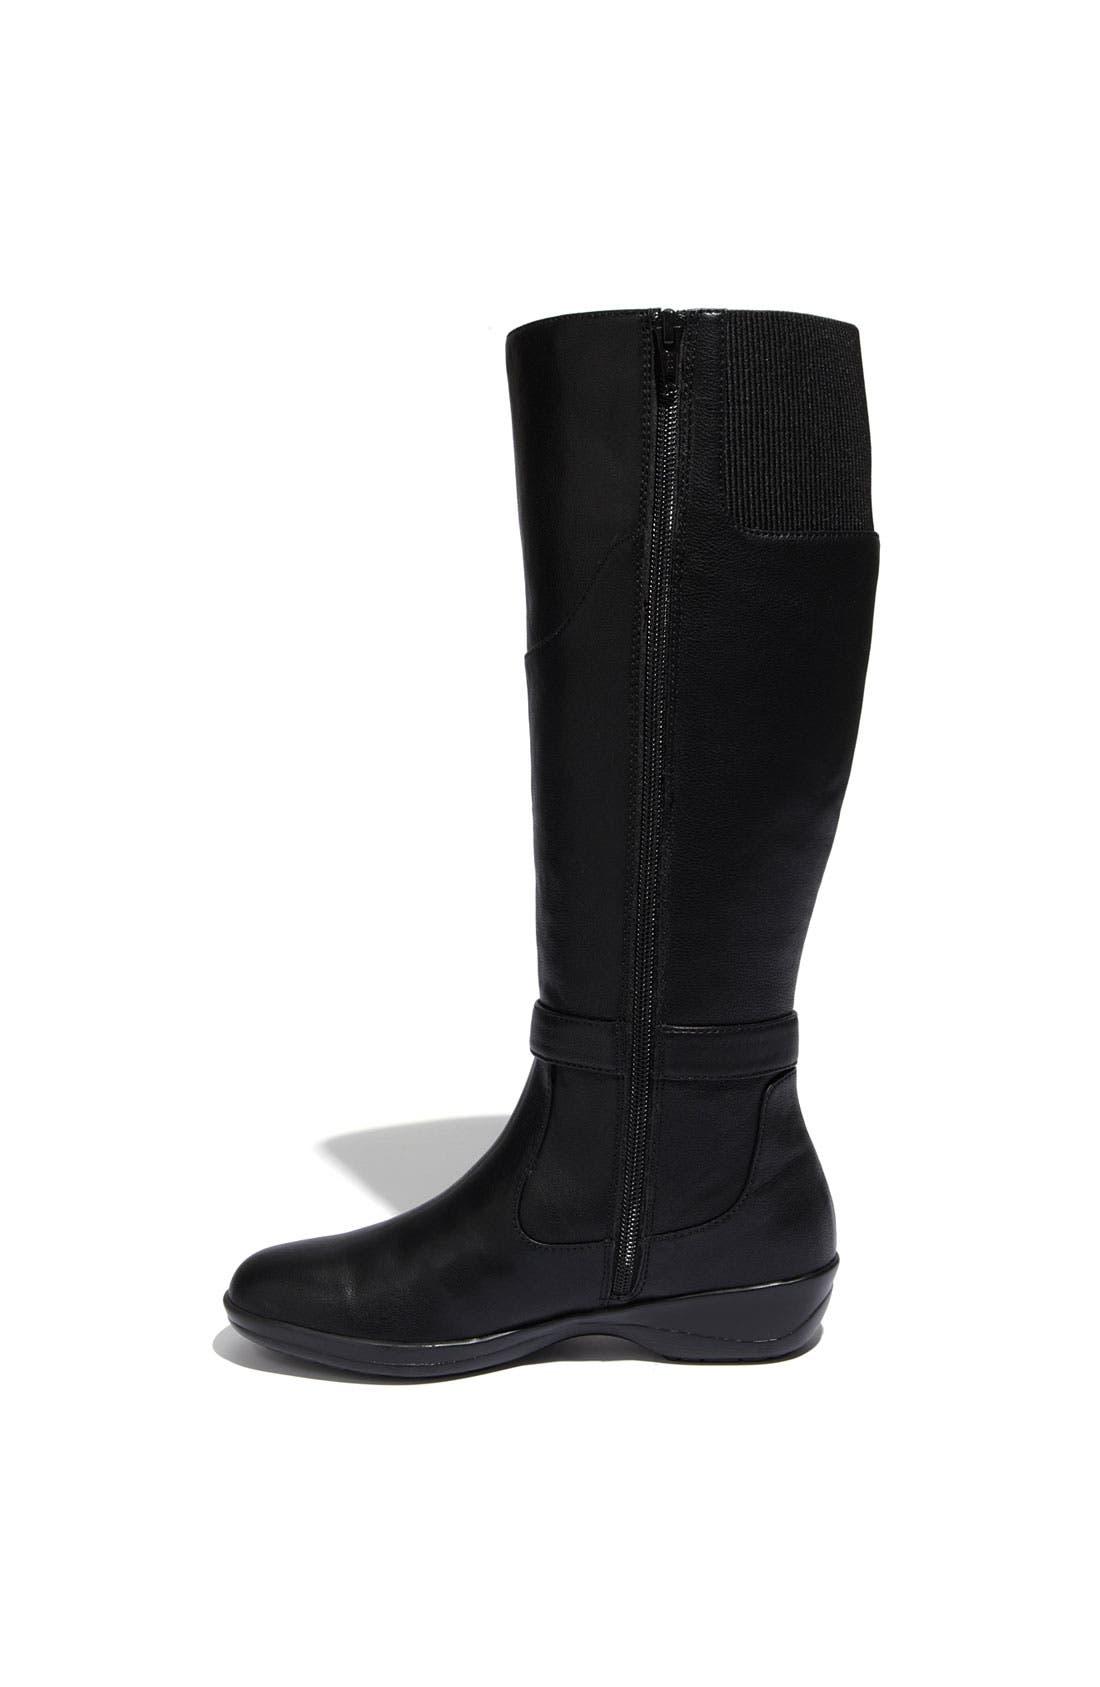 Alternate Image 2  - Softspots 'Addell' Boot